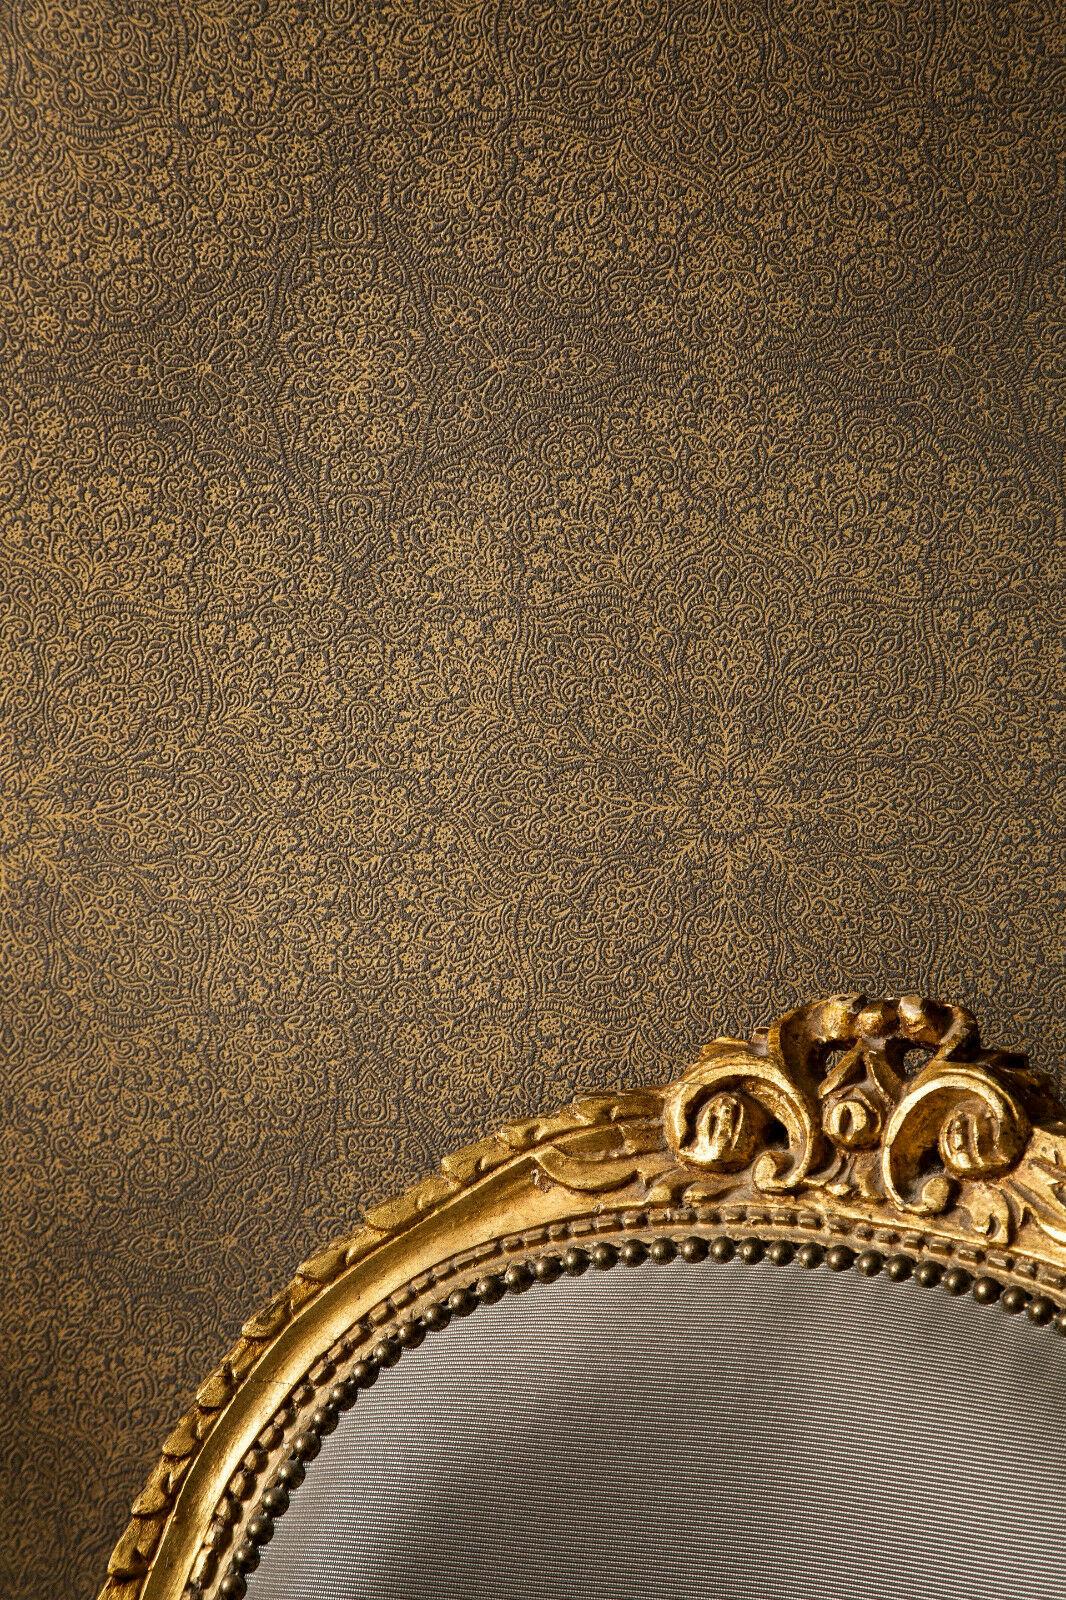 Vlies Tapete Mandala Muster Struktur Tapete Braun Gold Chacran